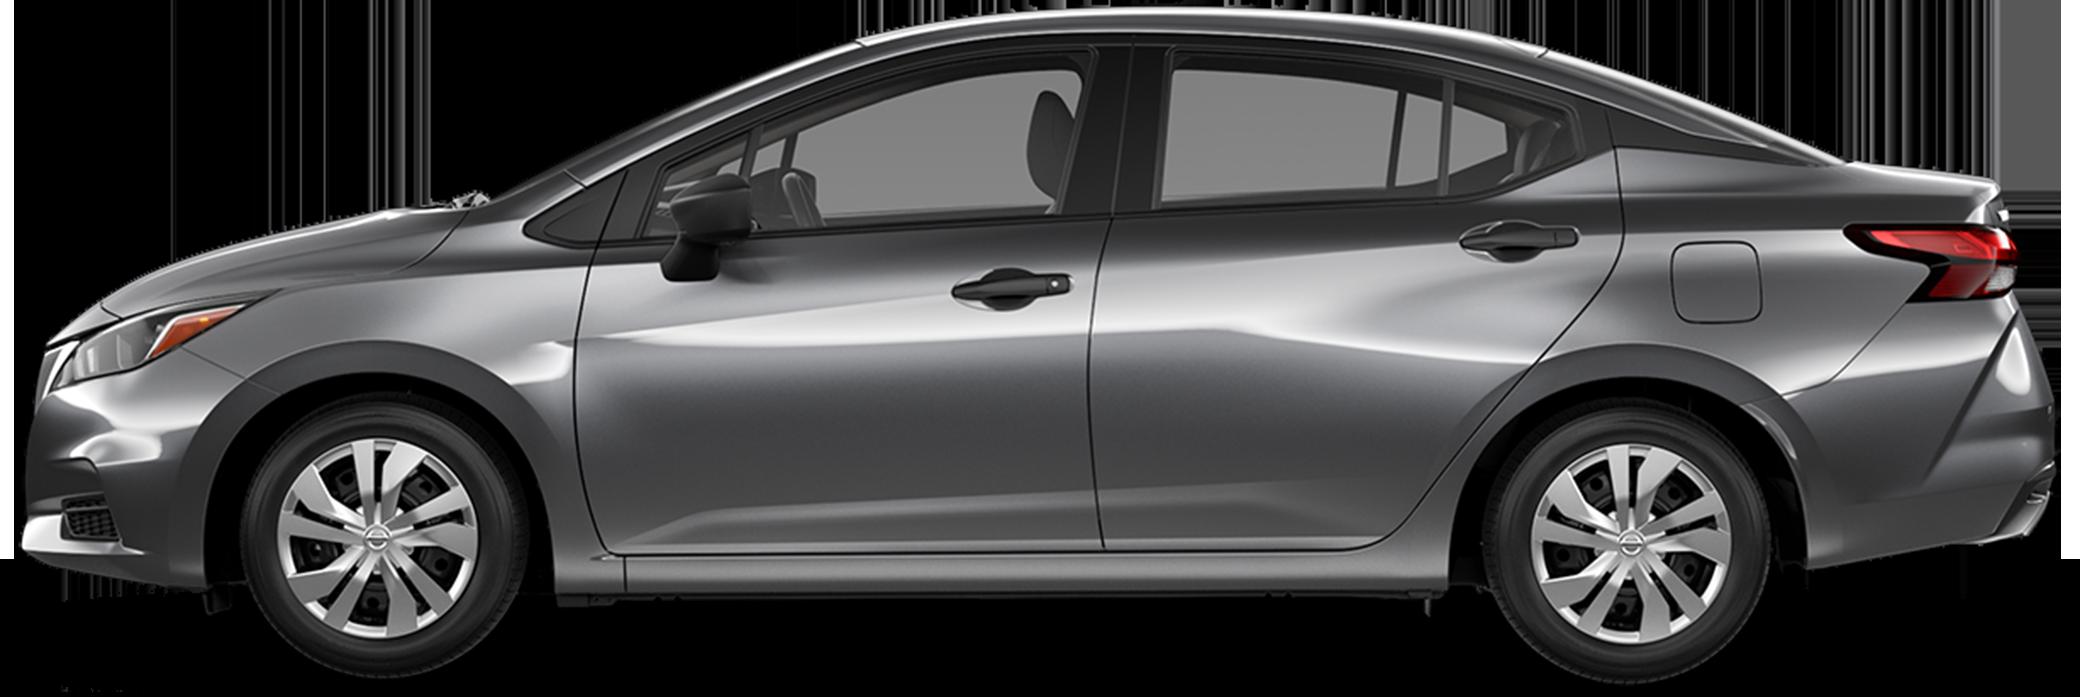 2021 Nissan Versa Sedan 1.6 S